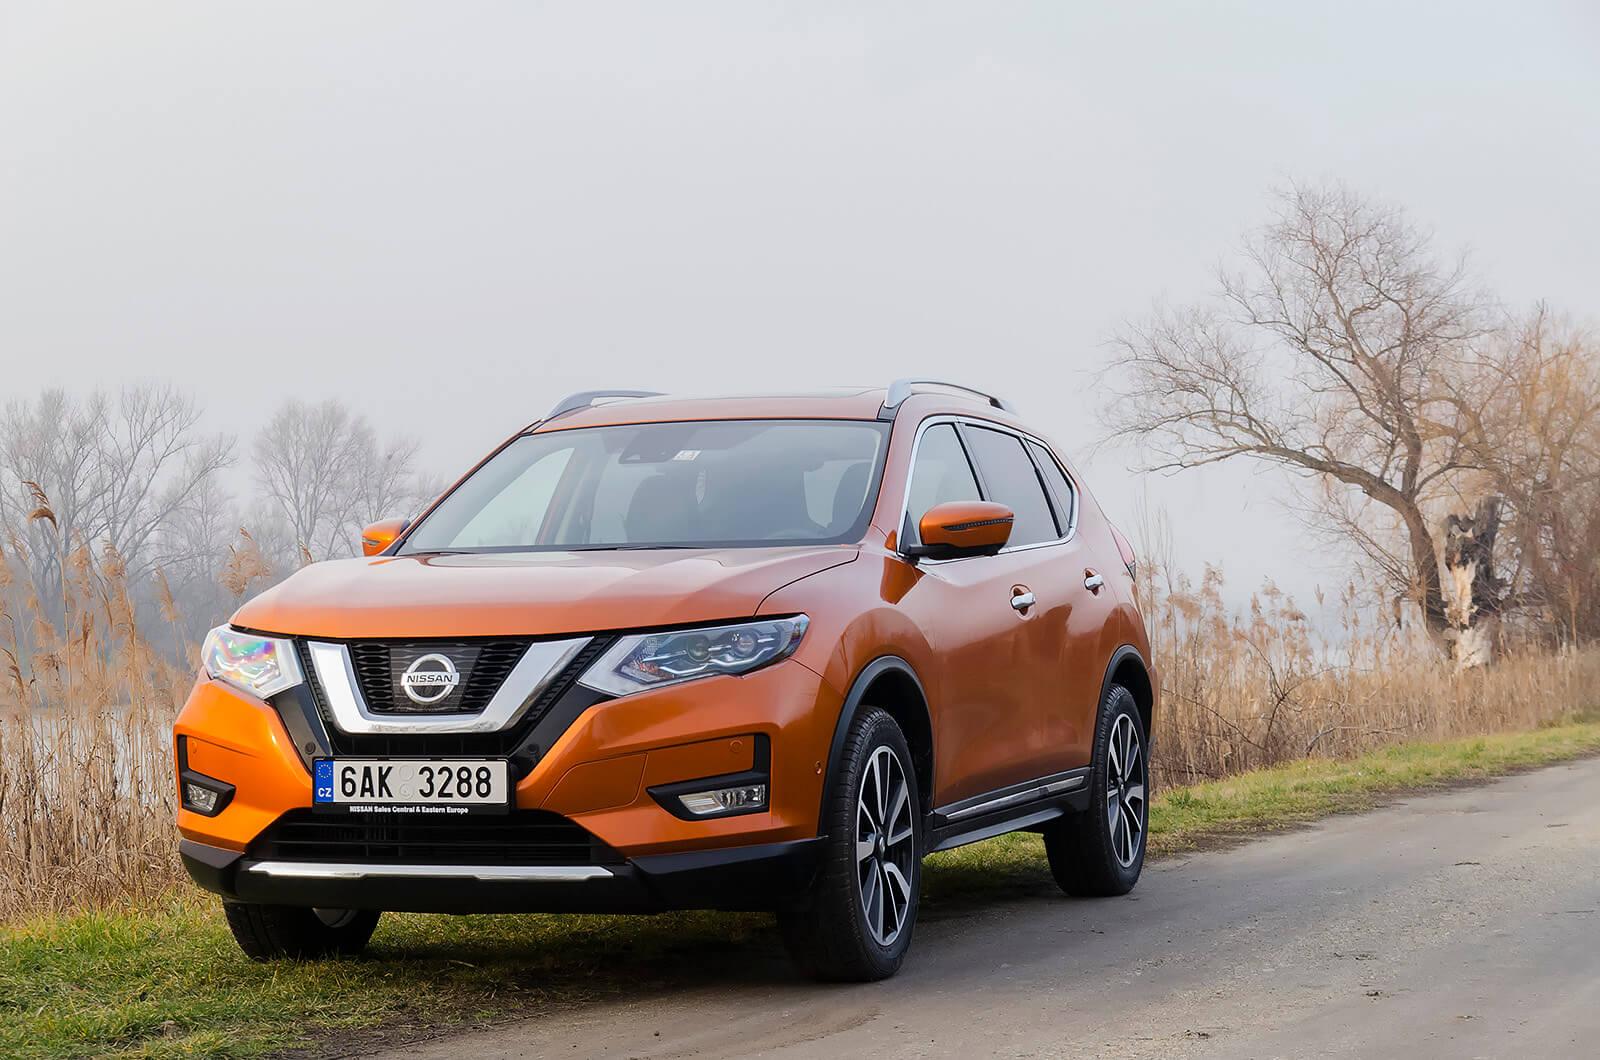 Nissan - Nissan X-trail - Nissan teszt - férfimagazin